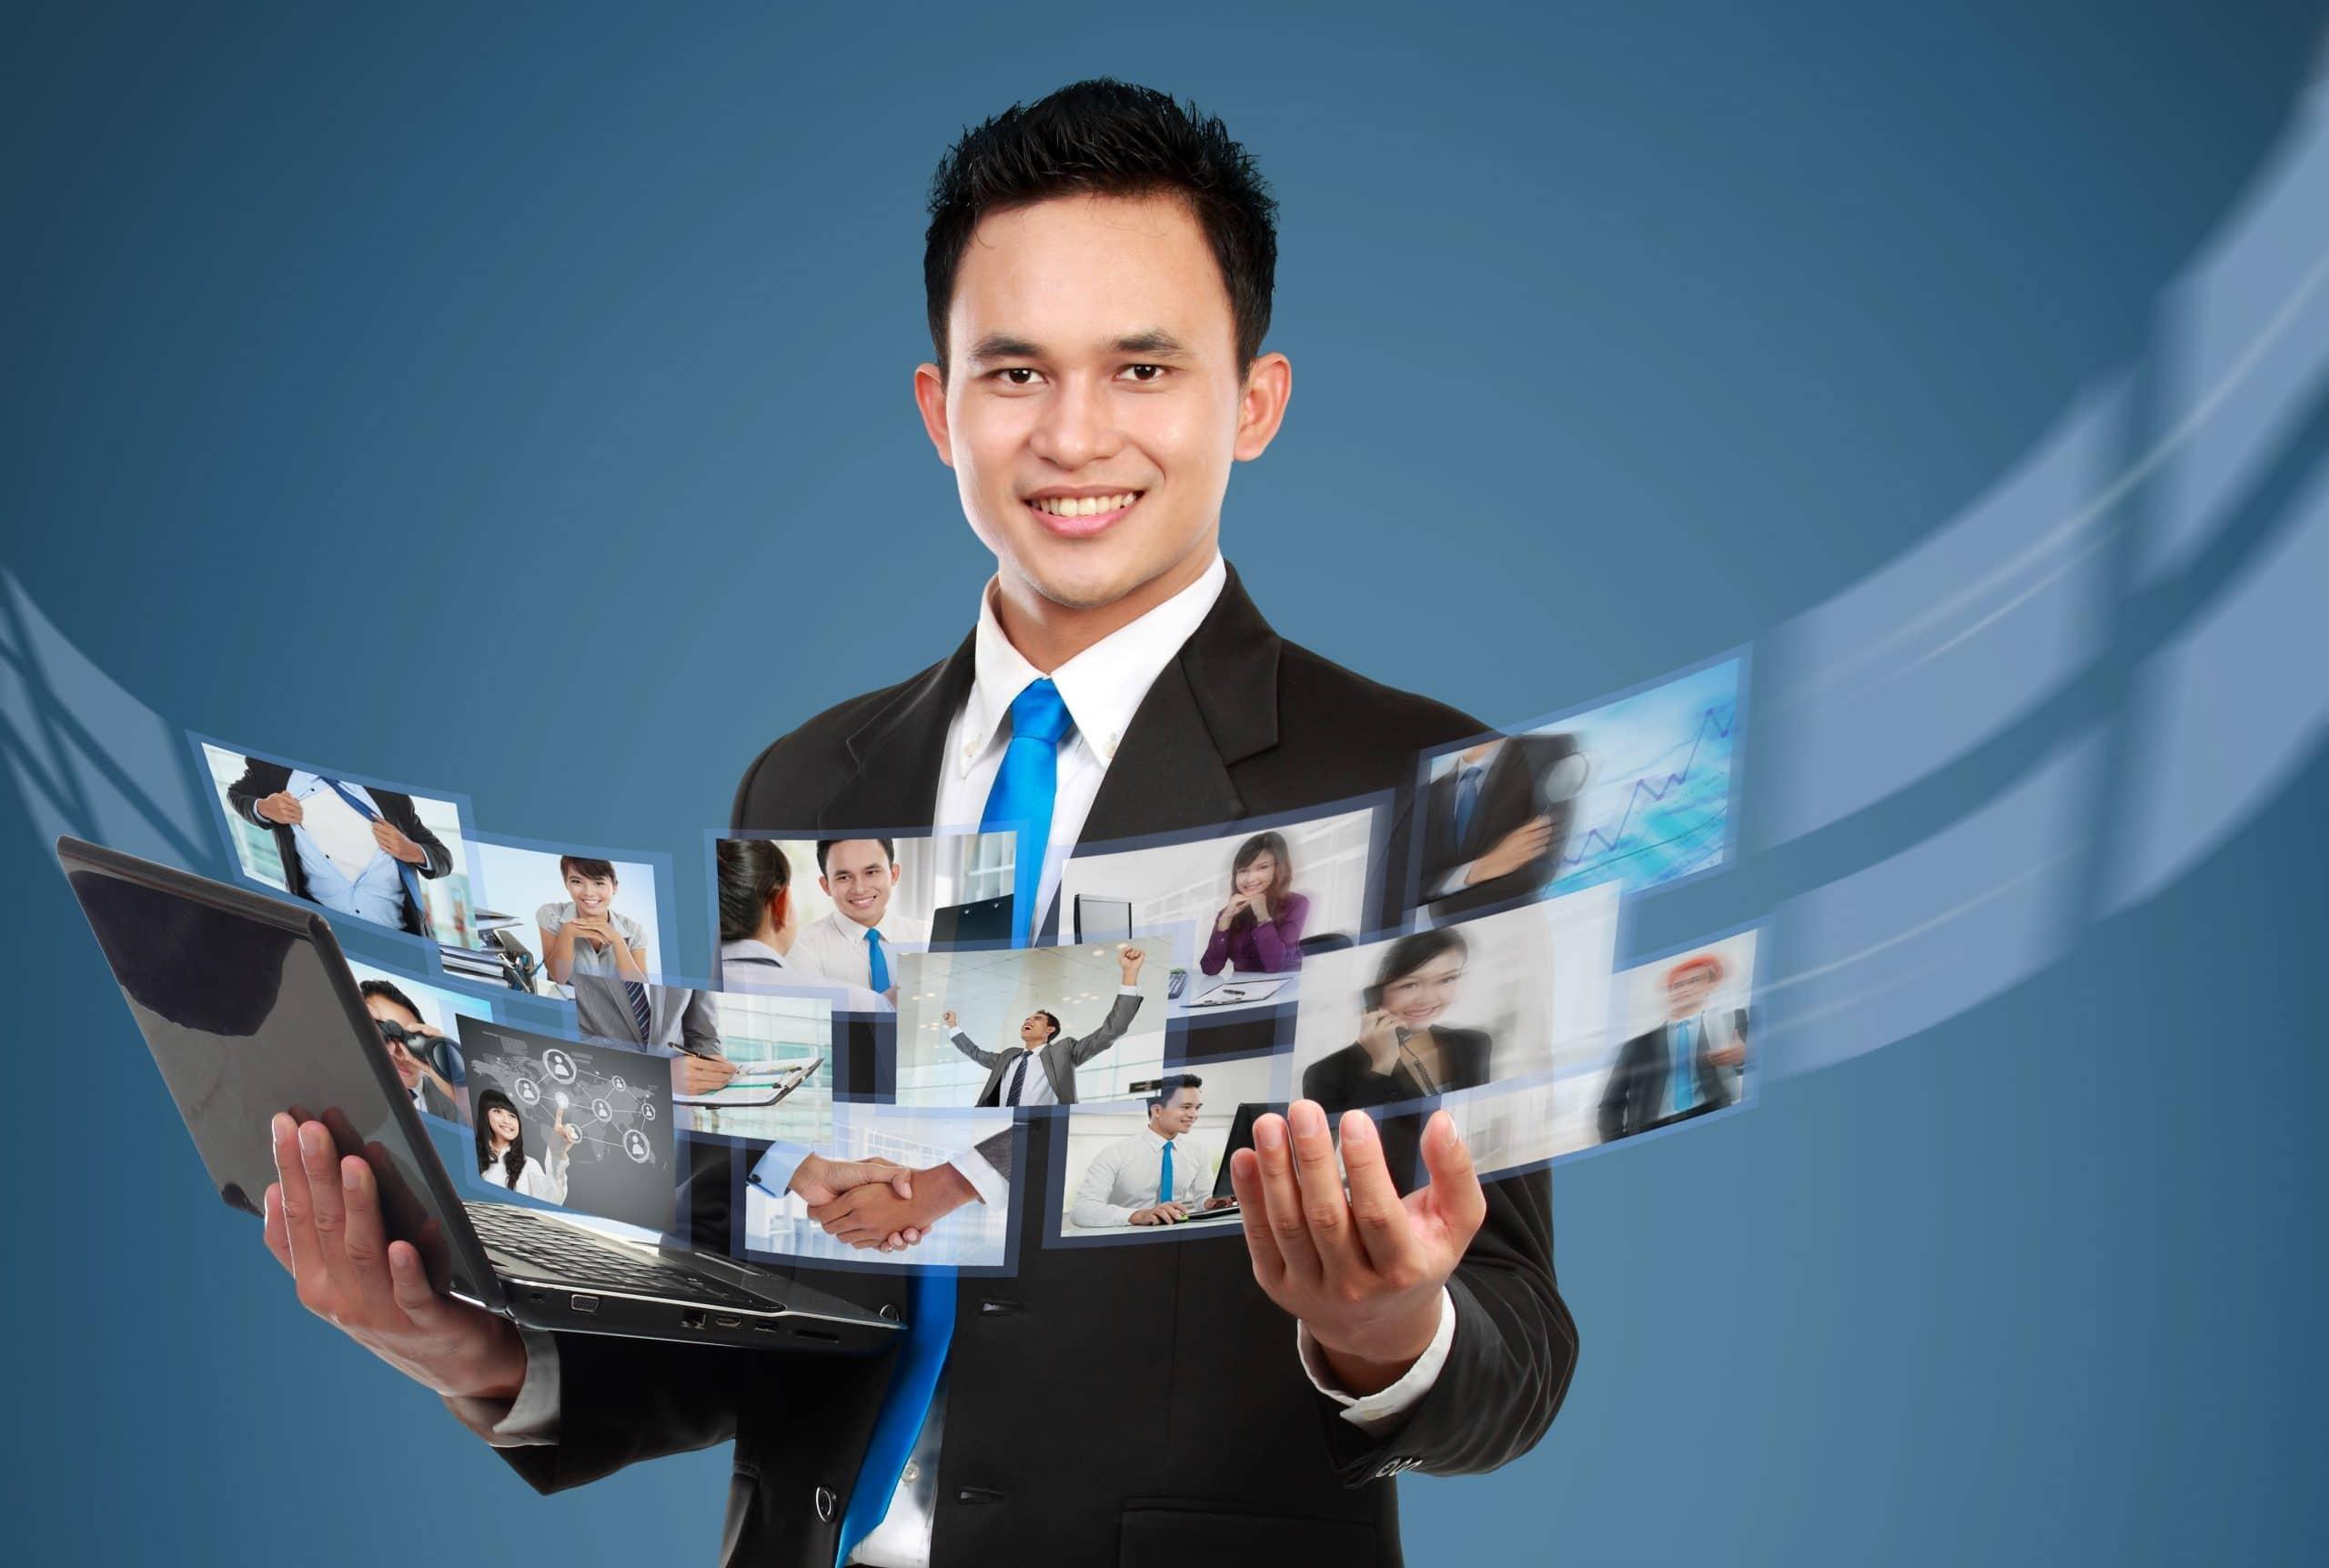 Ten Guidelines for Videoconferencing at Work